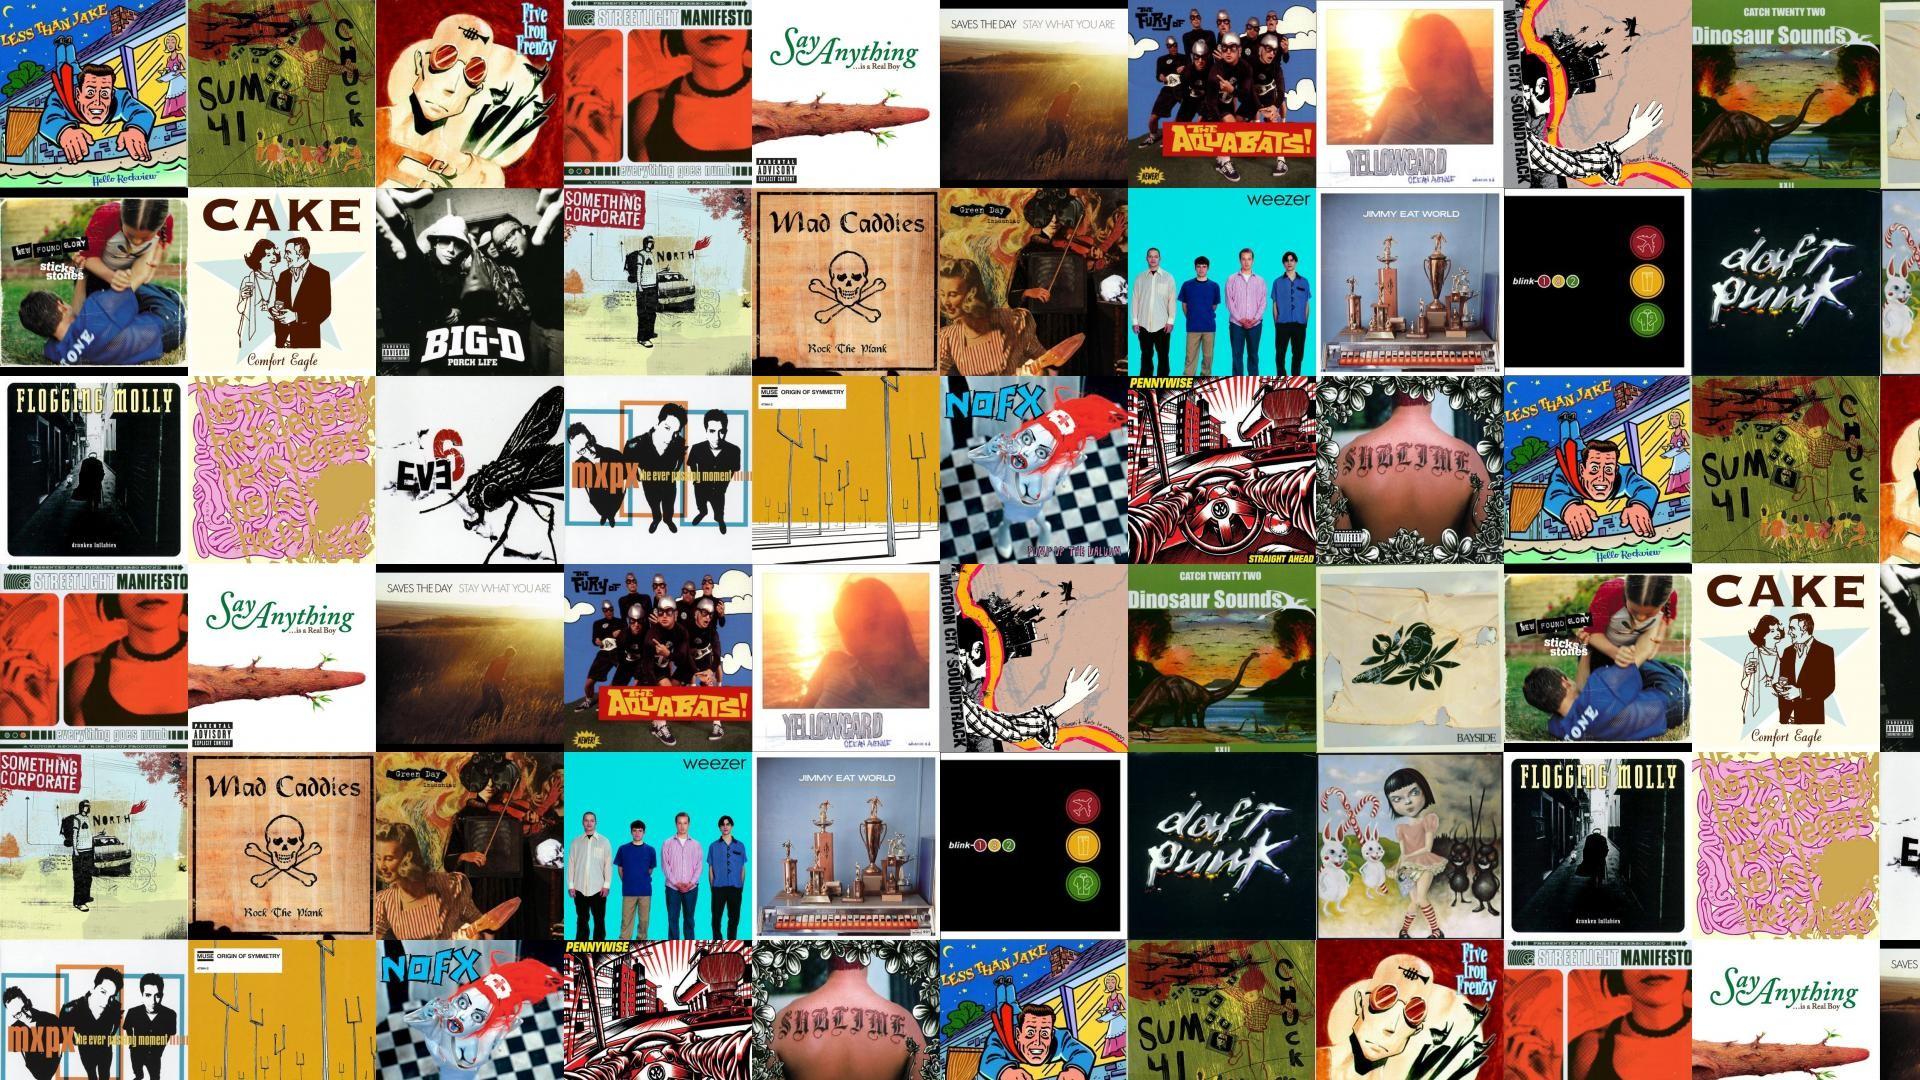 Less Than Jake Hello Rockview Sum 41 Wallpaper Â« Tiled Desktop Wallpaper